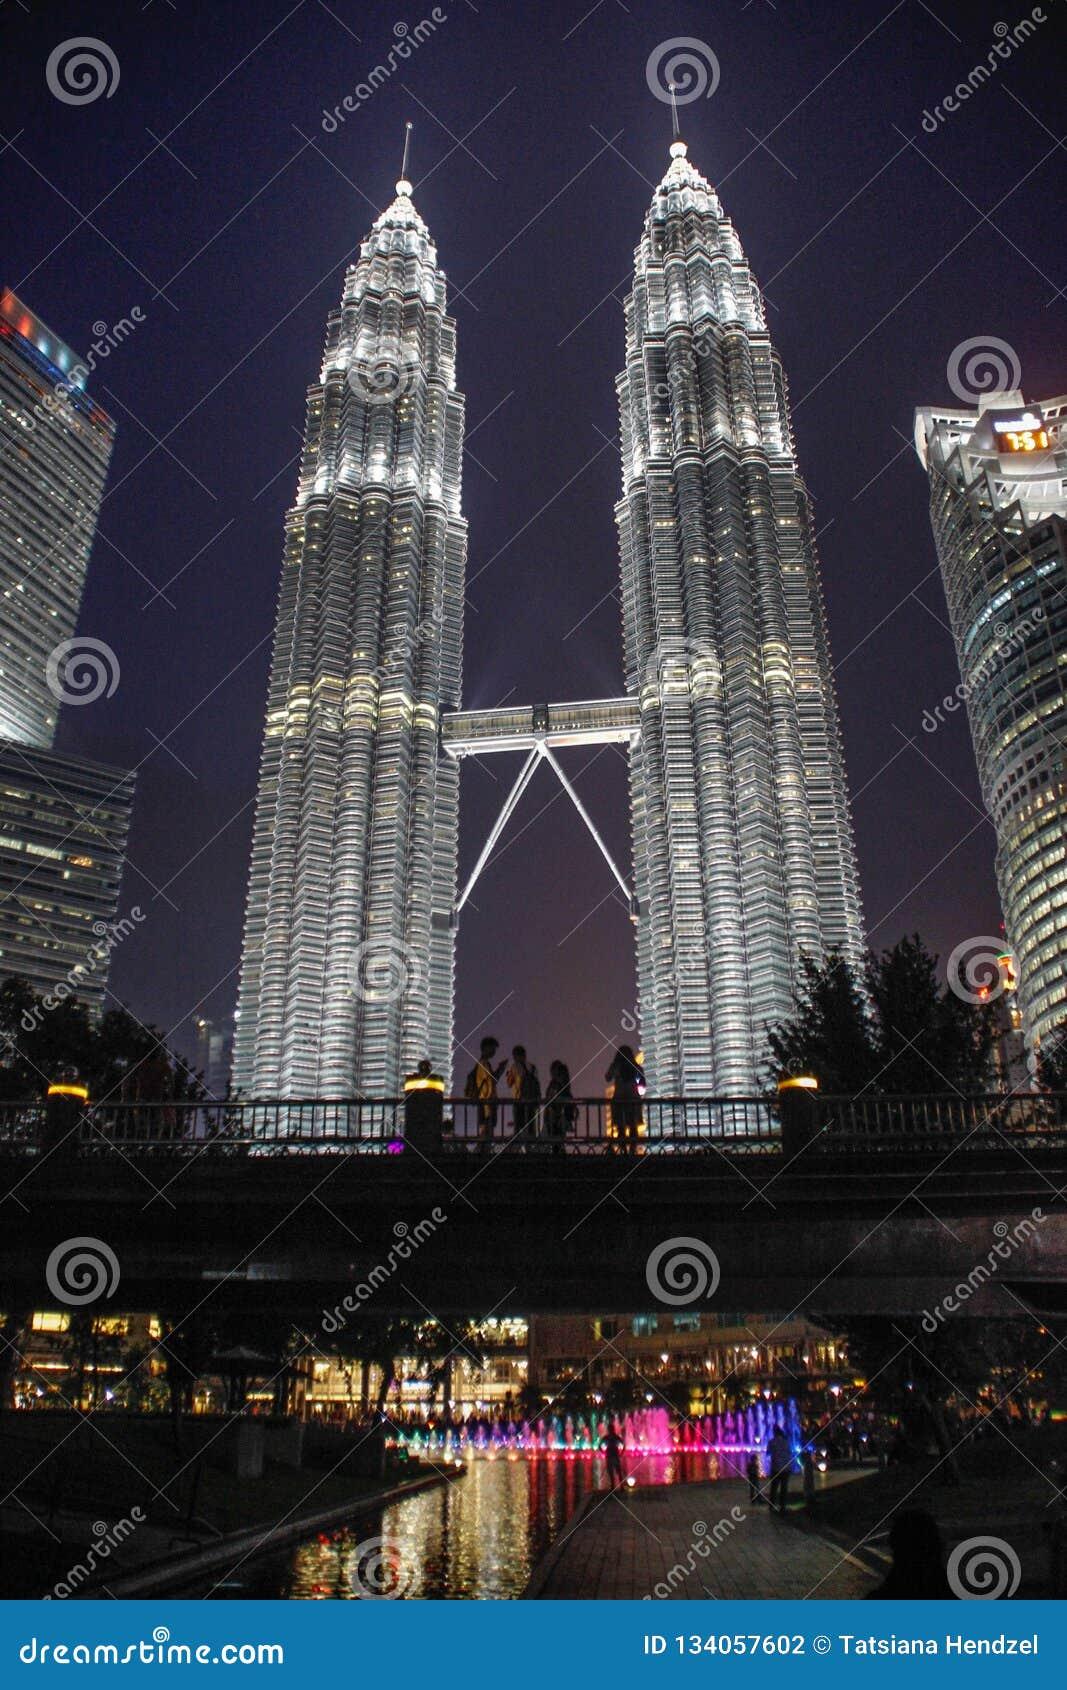 Le torri gemelle famose di Petronas